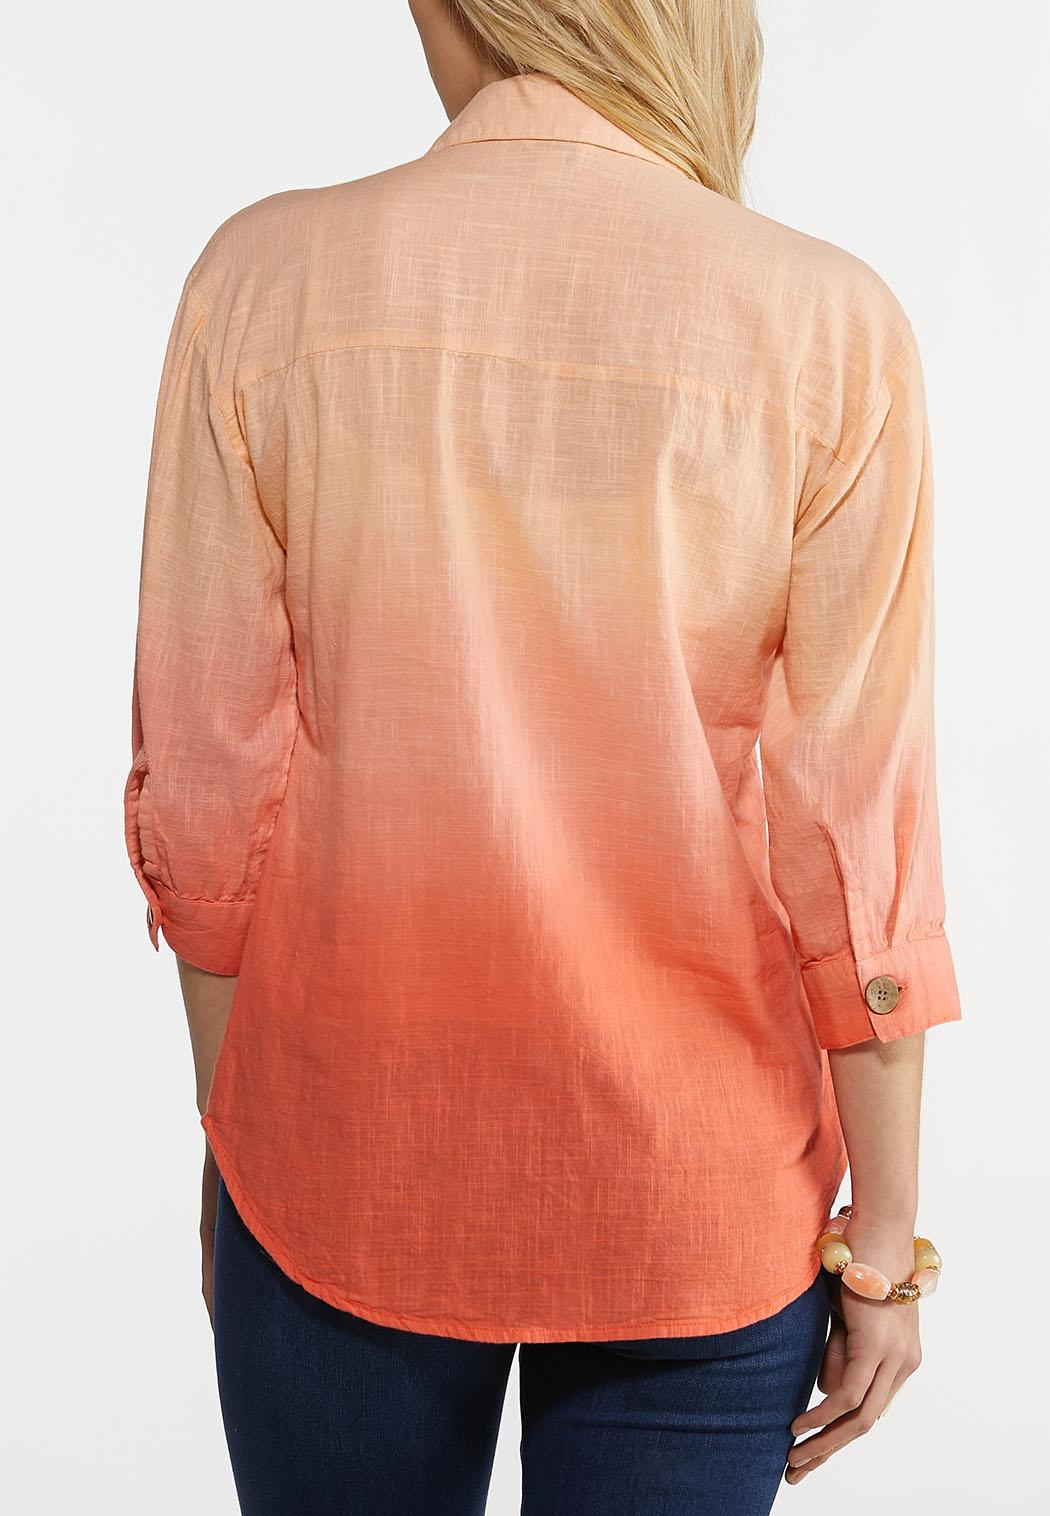 Coral Dip Dye Shirt (Item #44193849)